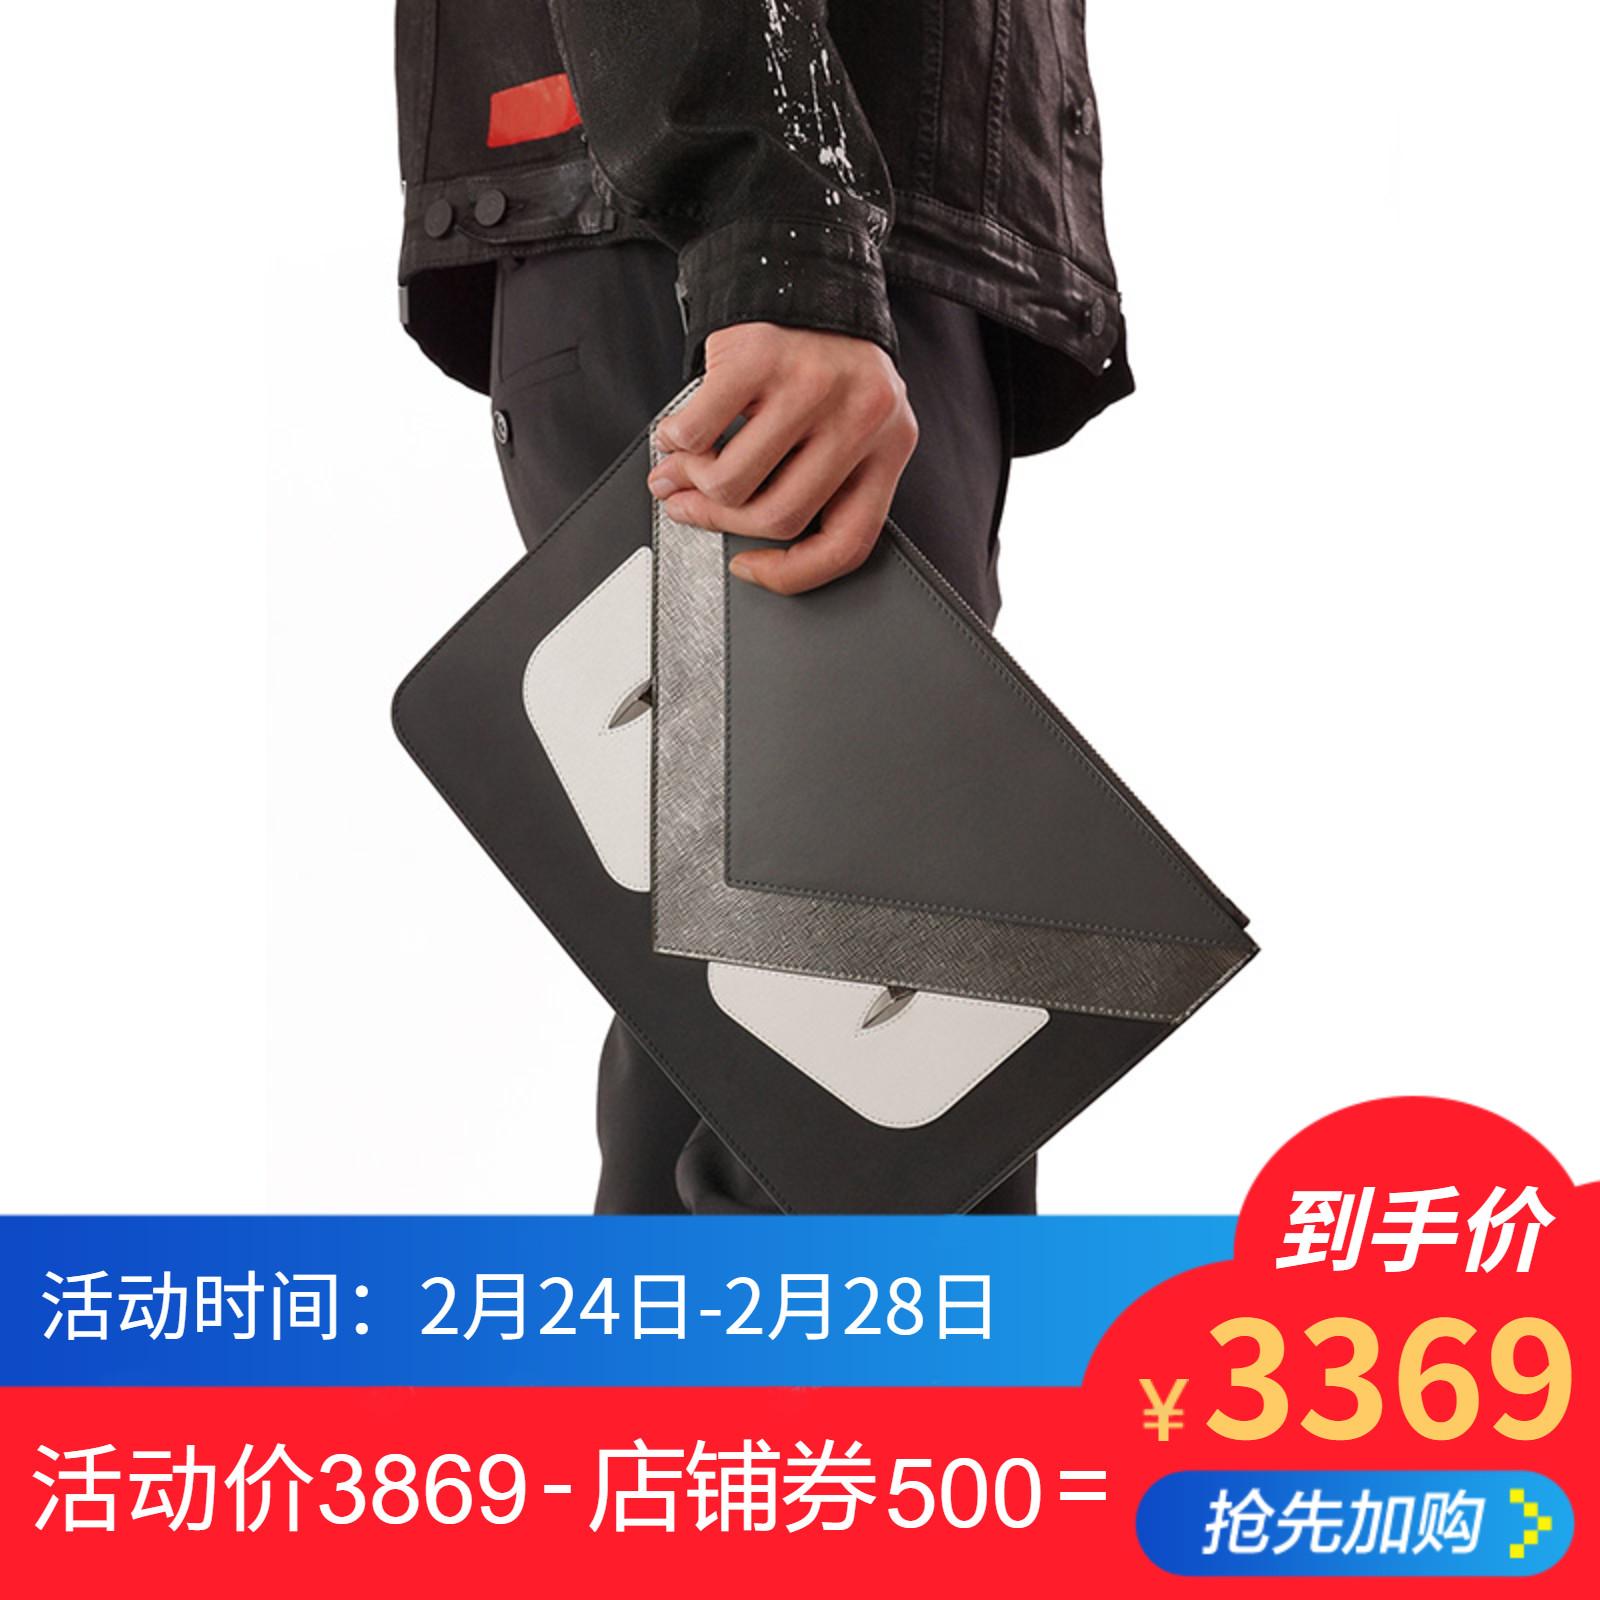 8FJ7N0078春夏男士小怪兽时尚牛皮手拿包2019正品芬迪FENDI